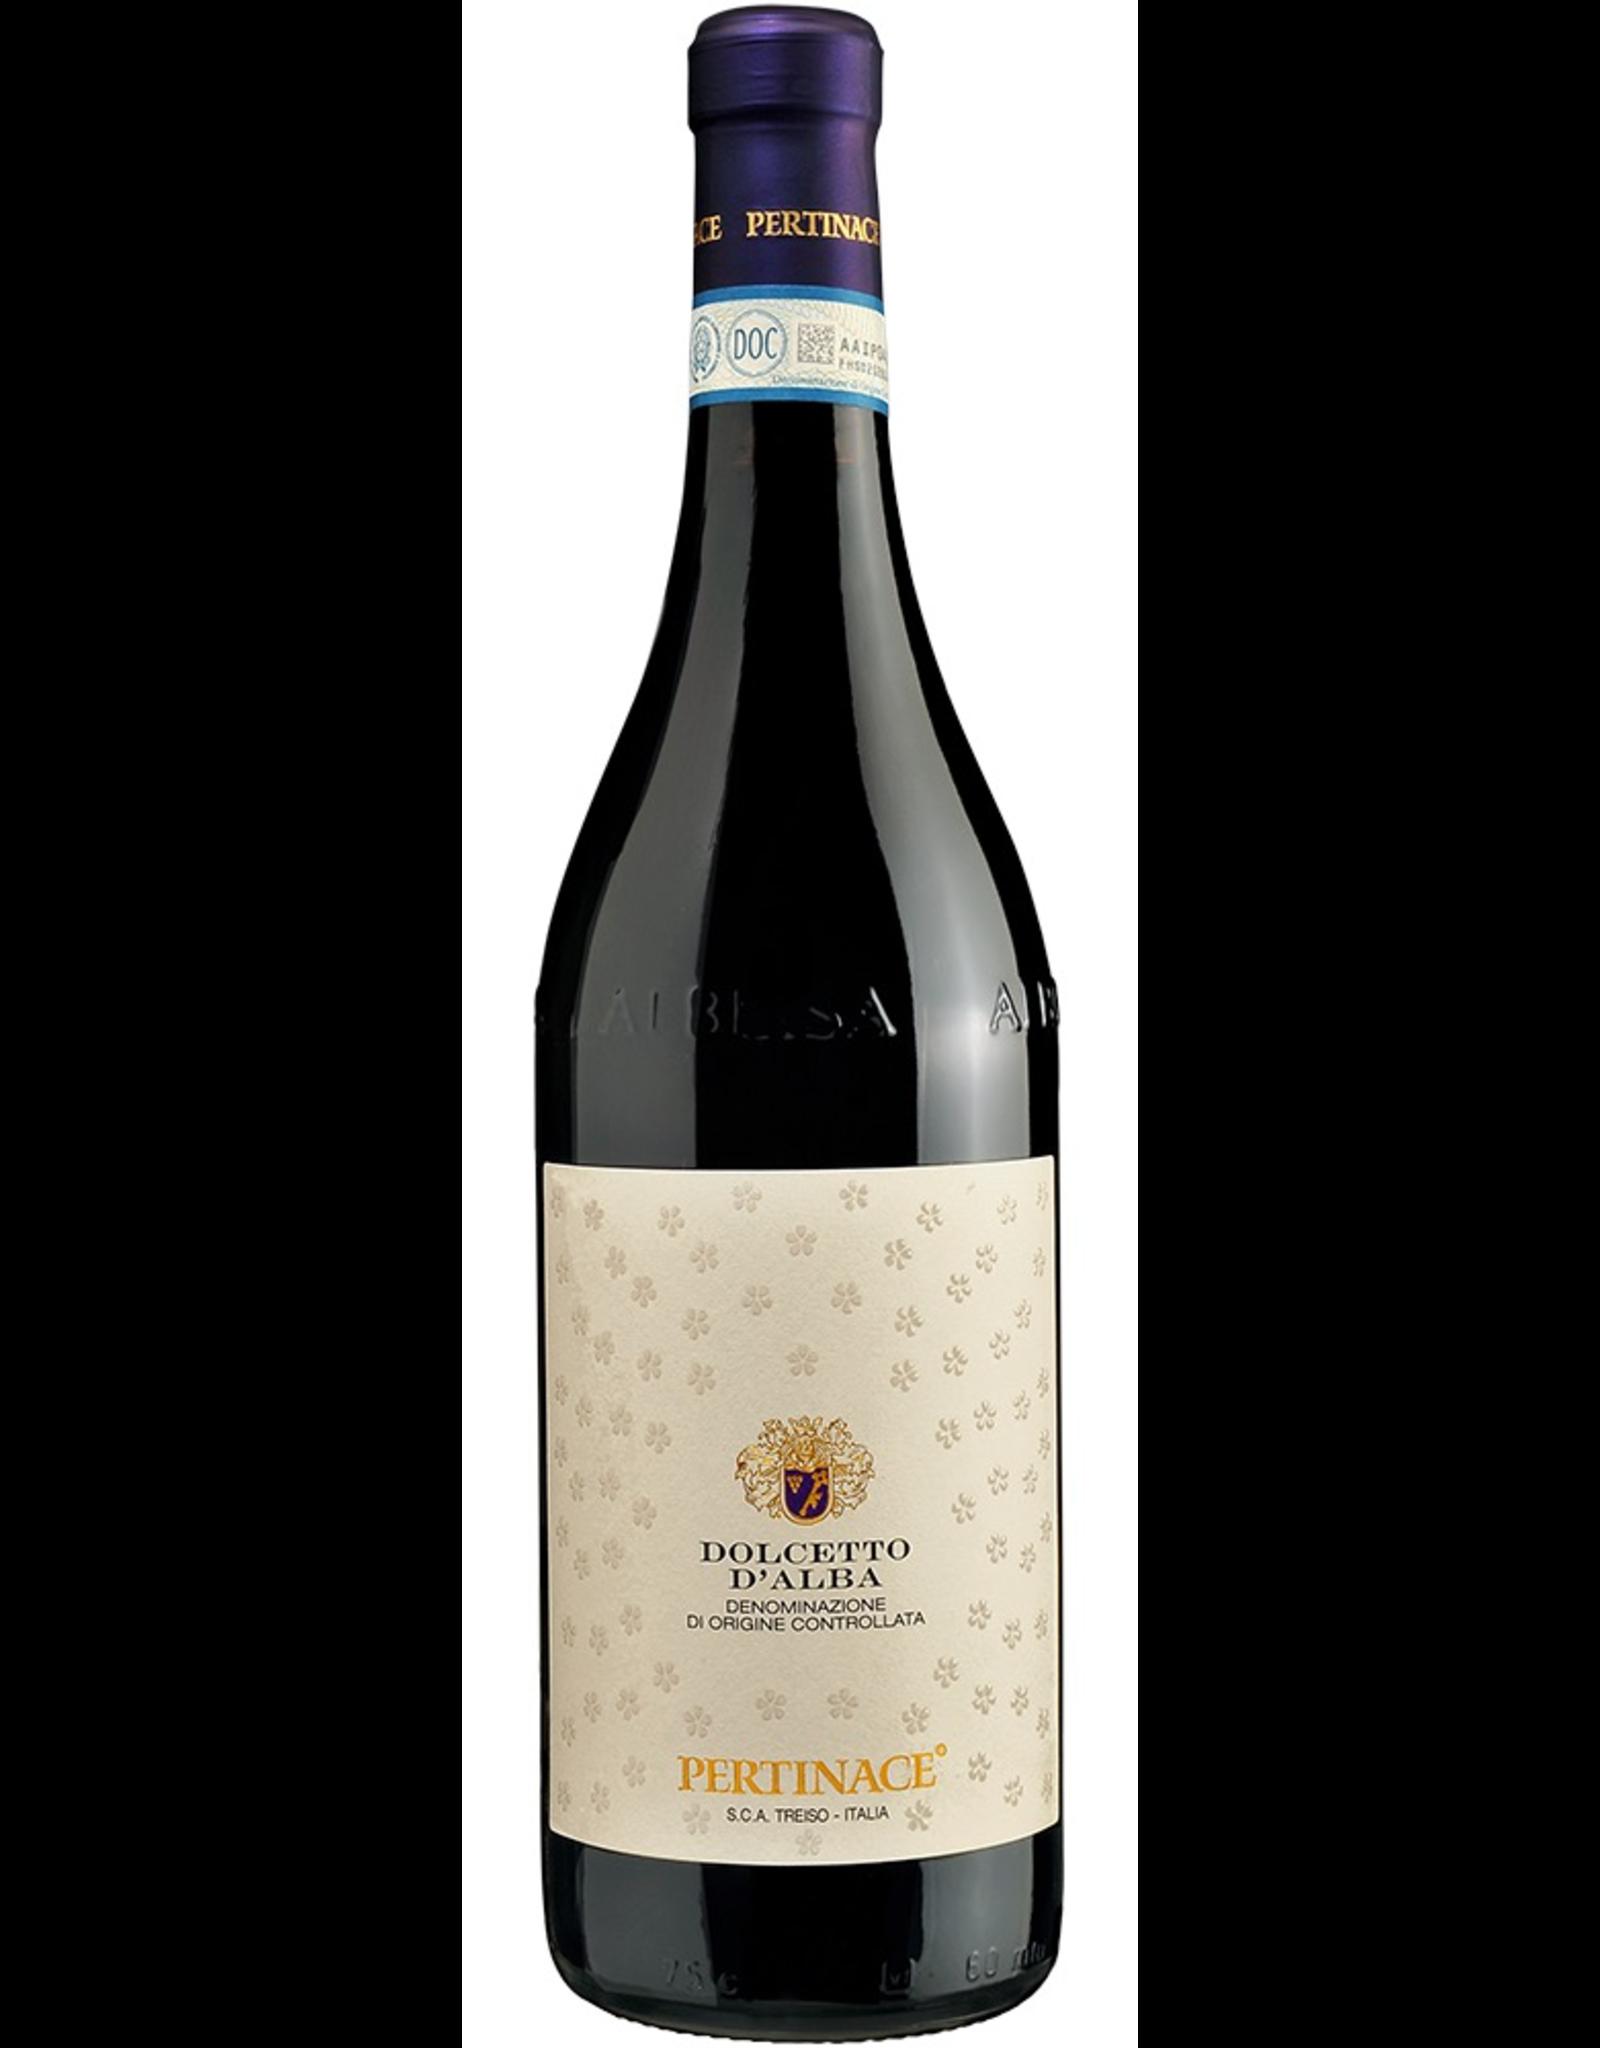 Red Wine 2016, Pertinace, Dolcetto, Alba, Piemonte, Italy, 13.5% Alc, CTnr, TW92